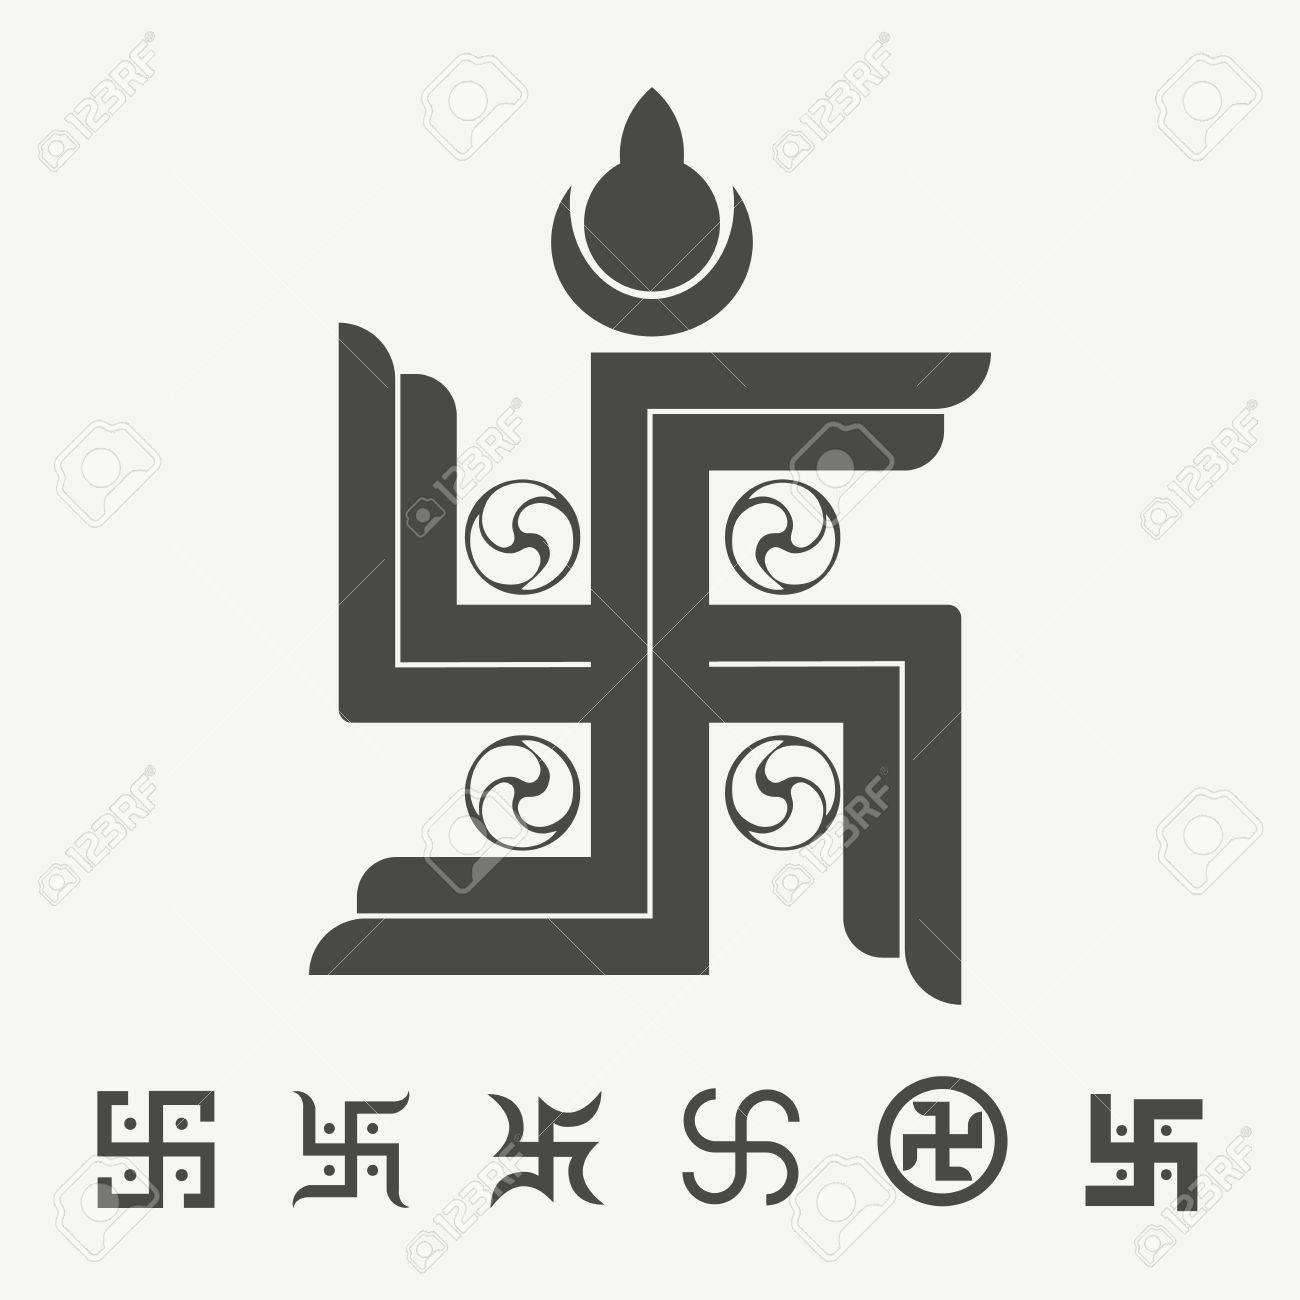 43815427-swastika-symbol-set-buddhist-tr